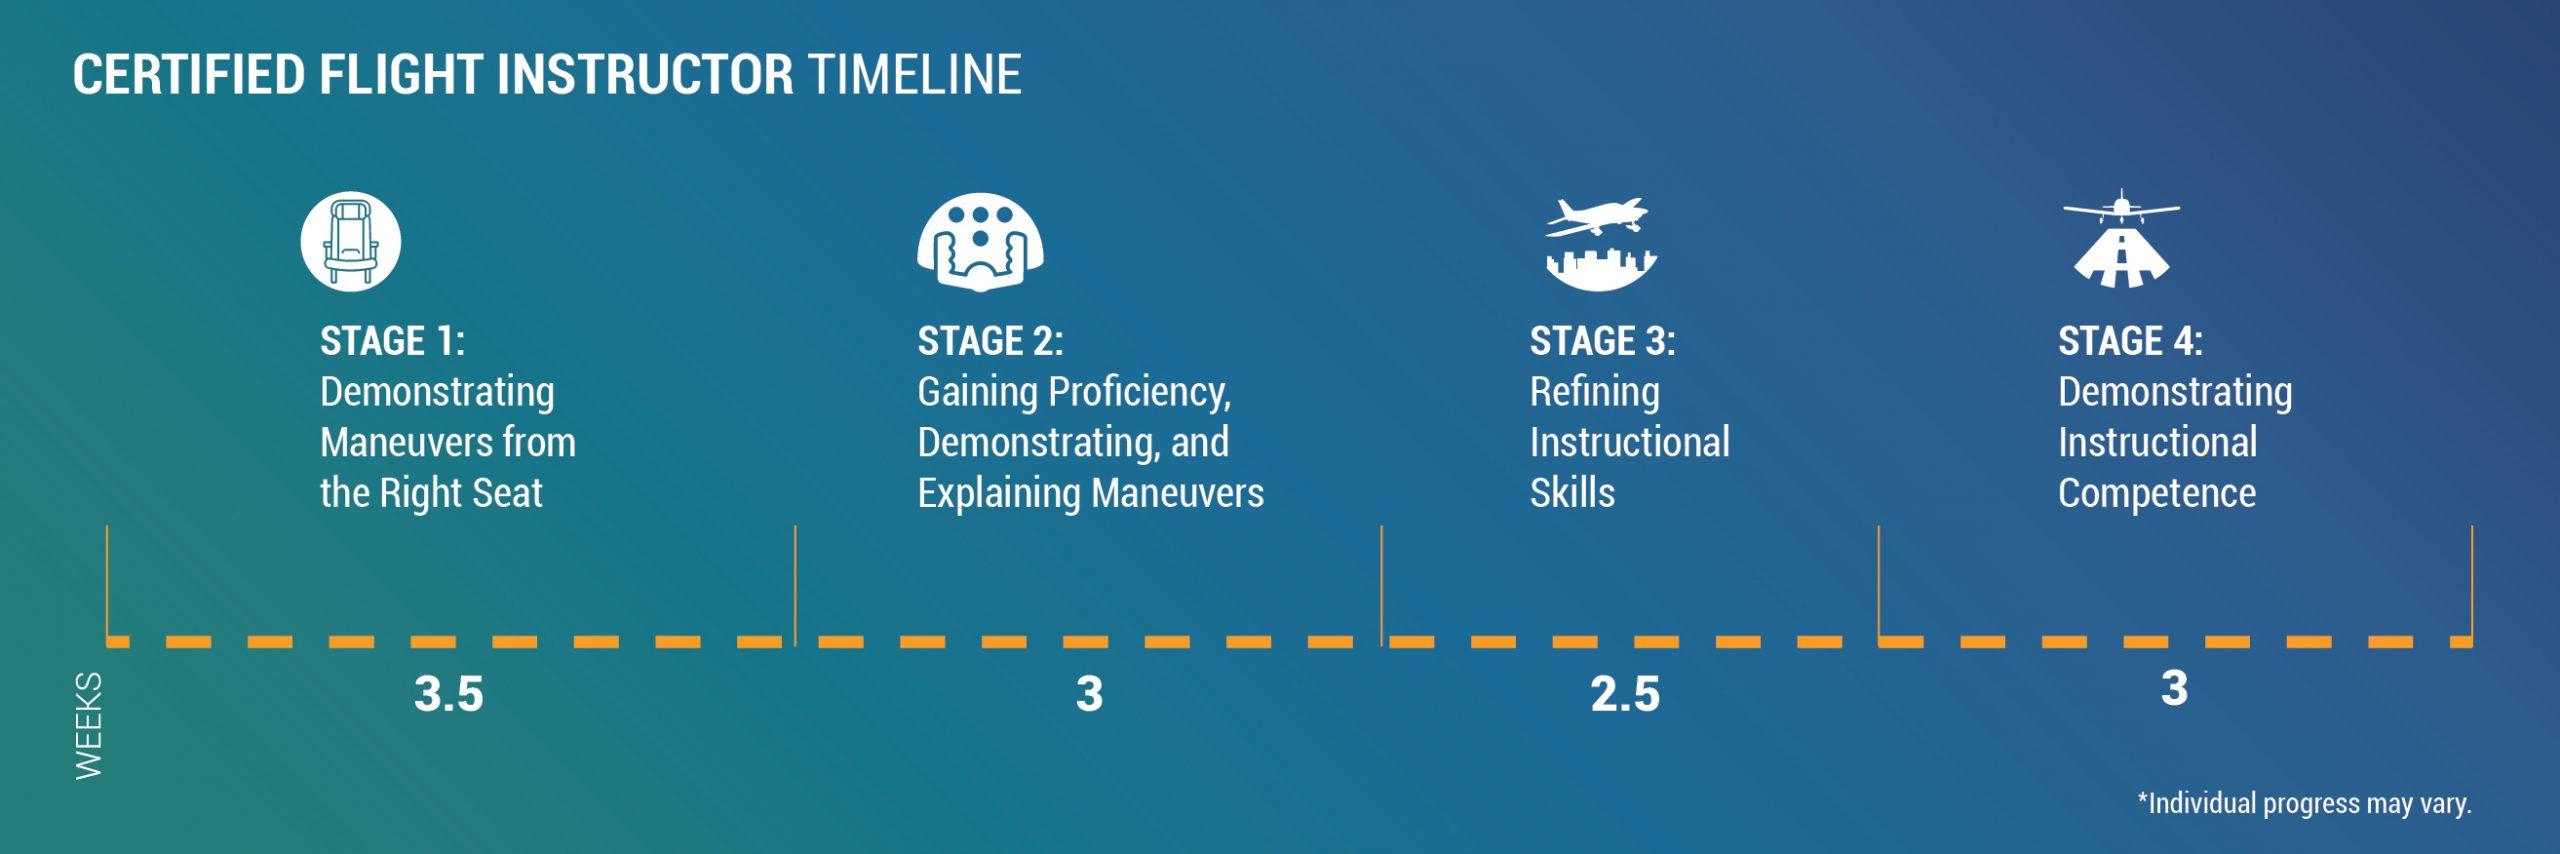 Flightgest Private Pilot Timeline